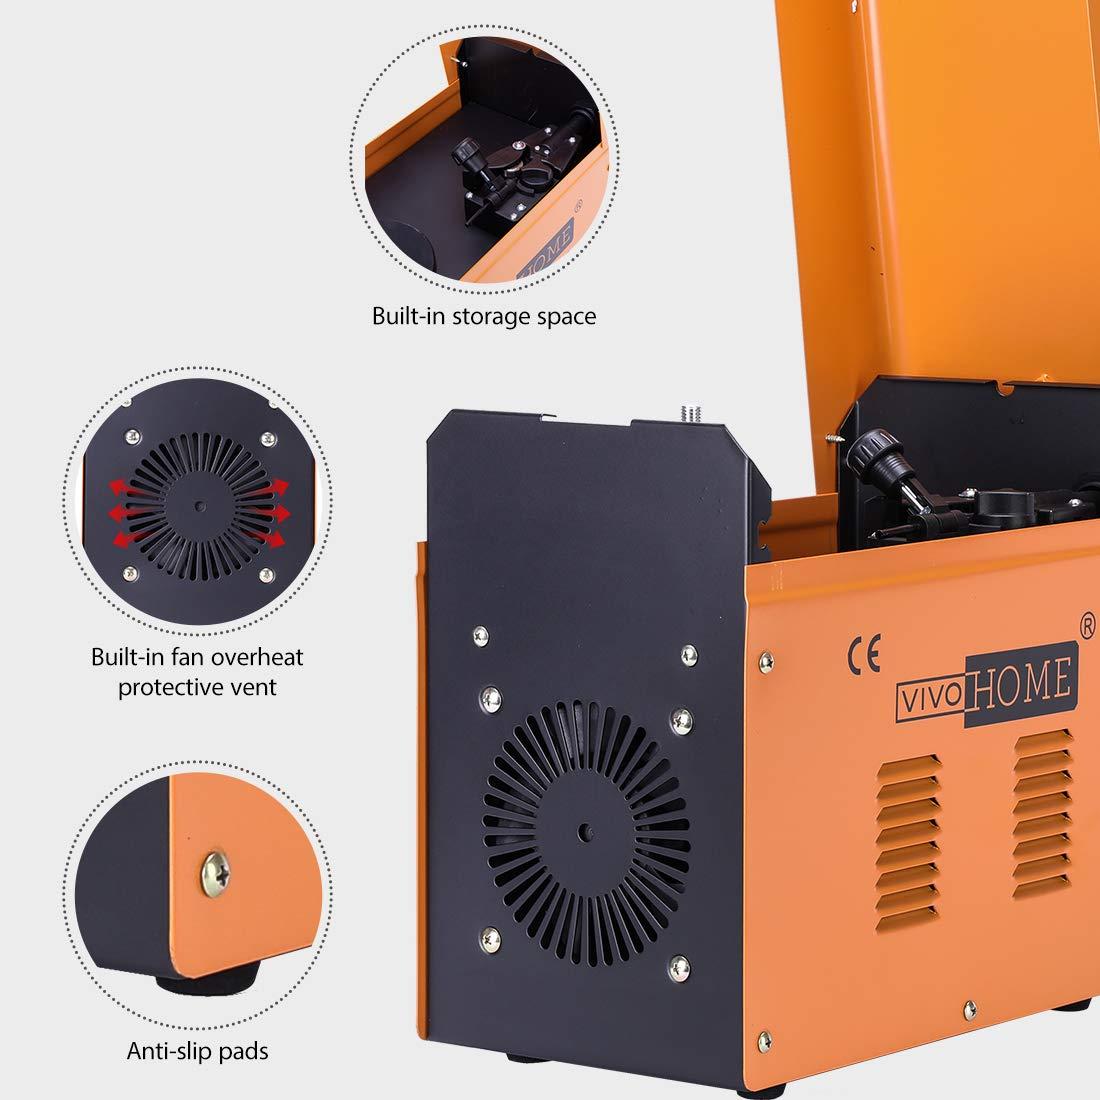 VIVOHOME Portable Flux Core Wire No Gas MIG 130 Welder Machine 110V by VIVOHOME (Image #4)